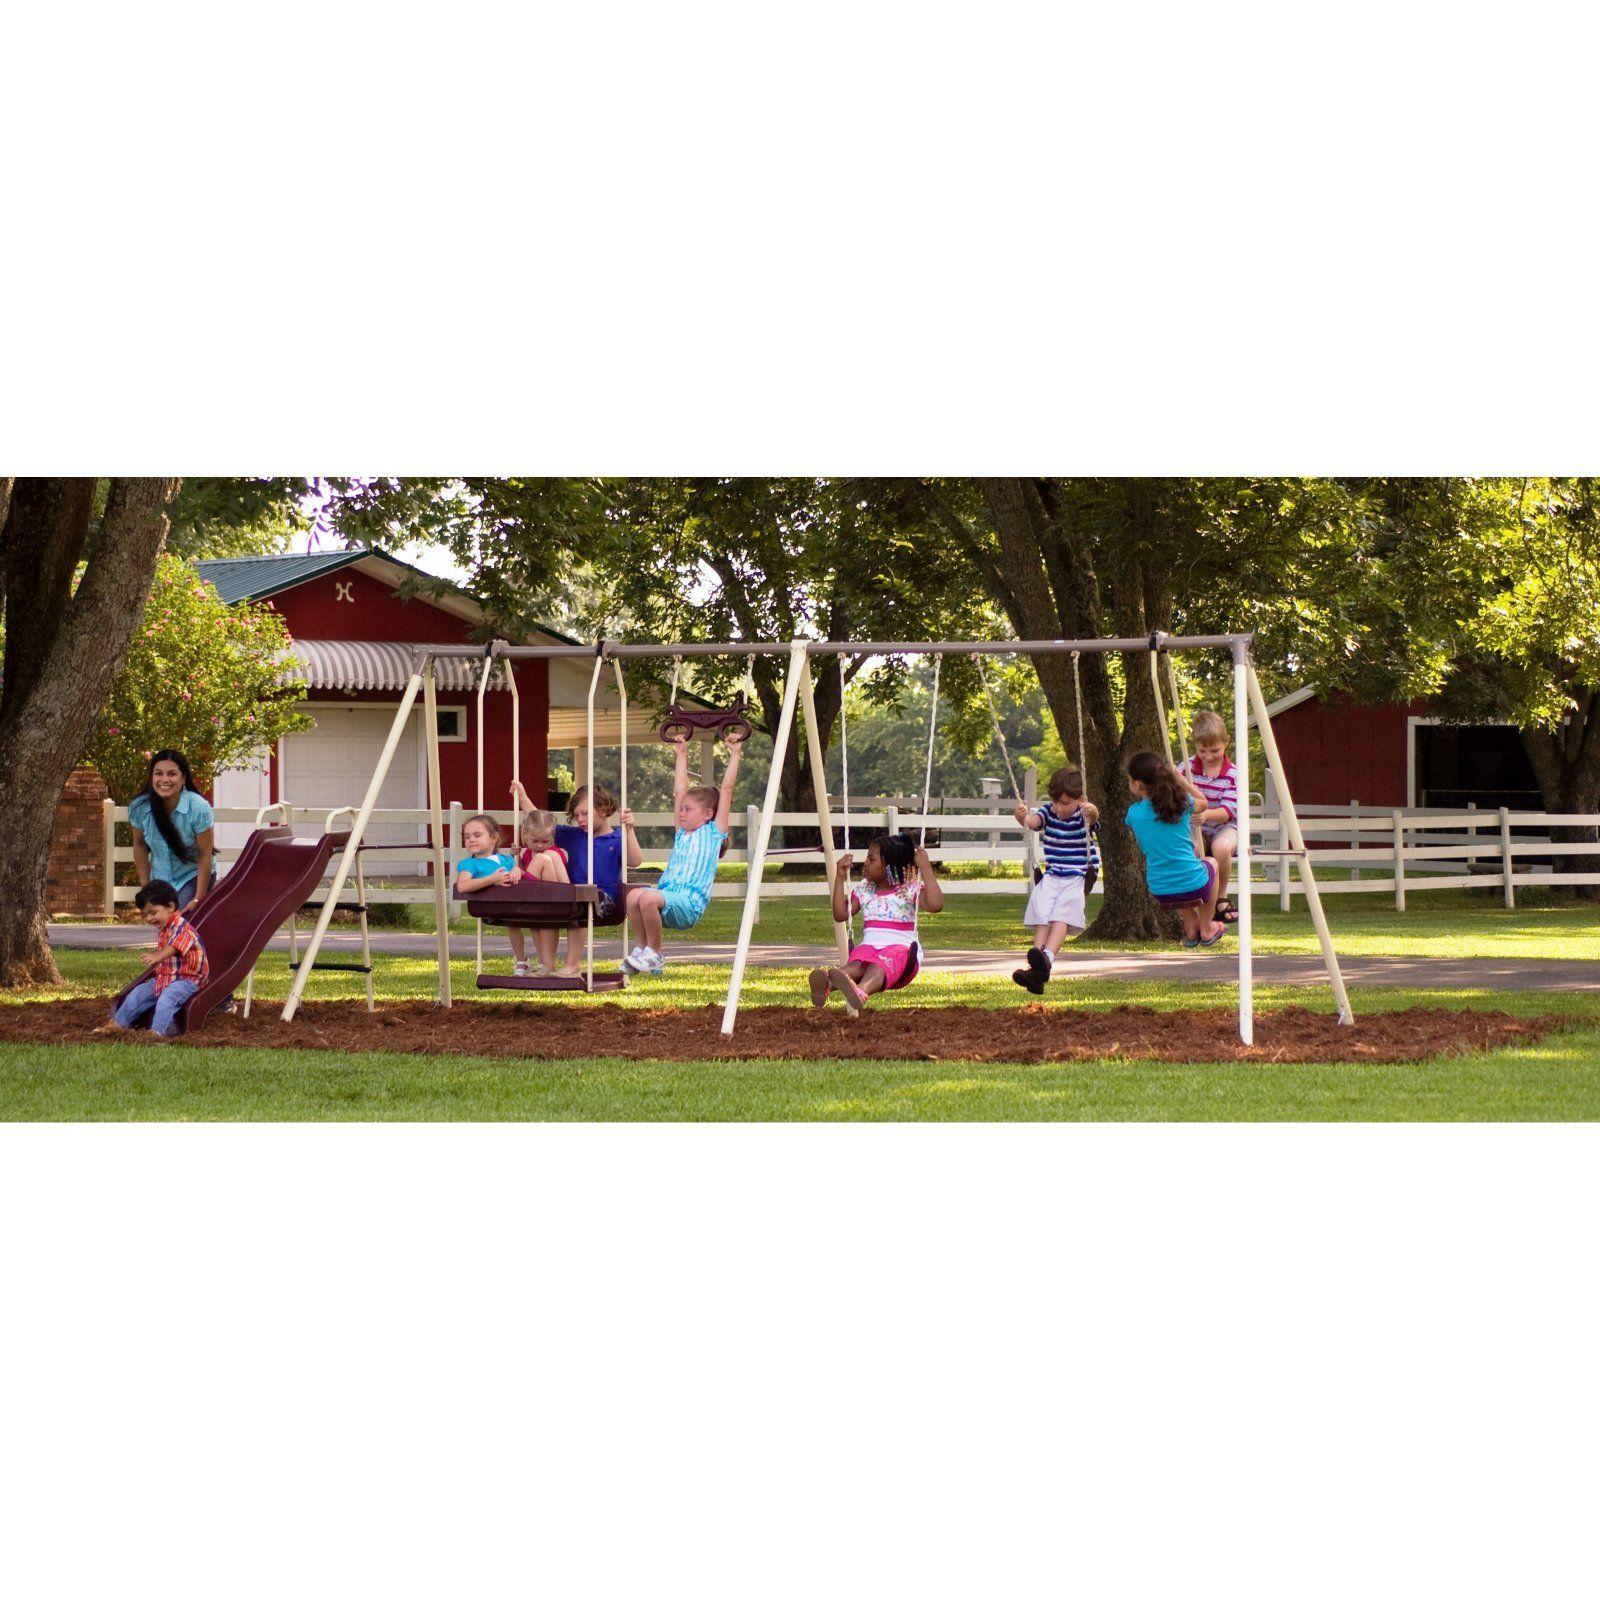 Flexible Flyer Play Park Swing Sets Pinterest Metal Swing Sets